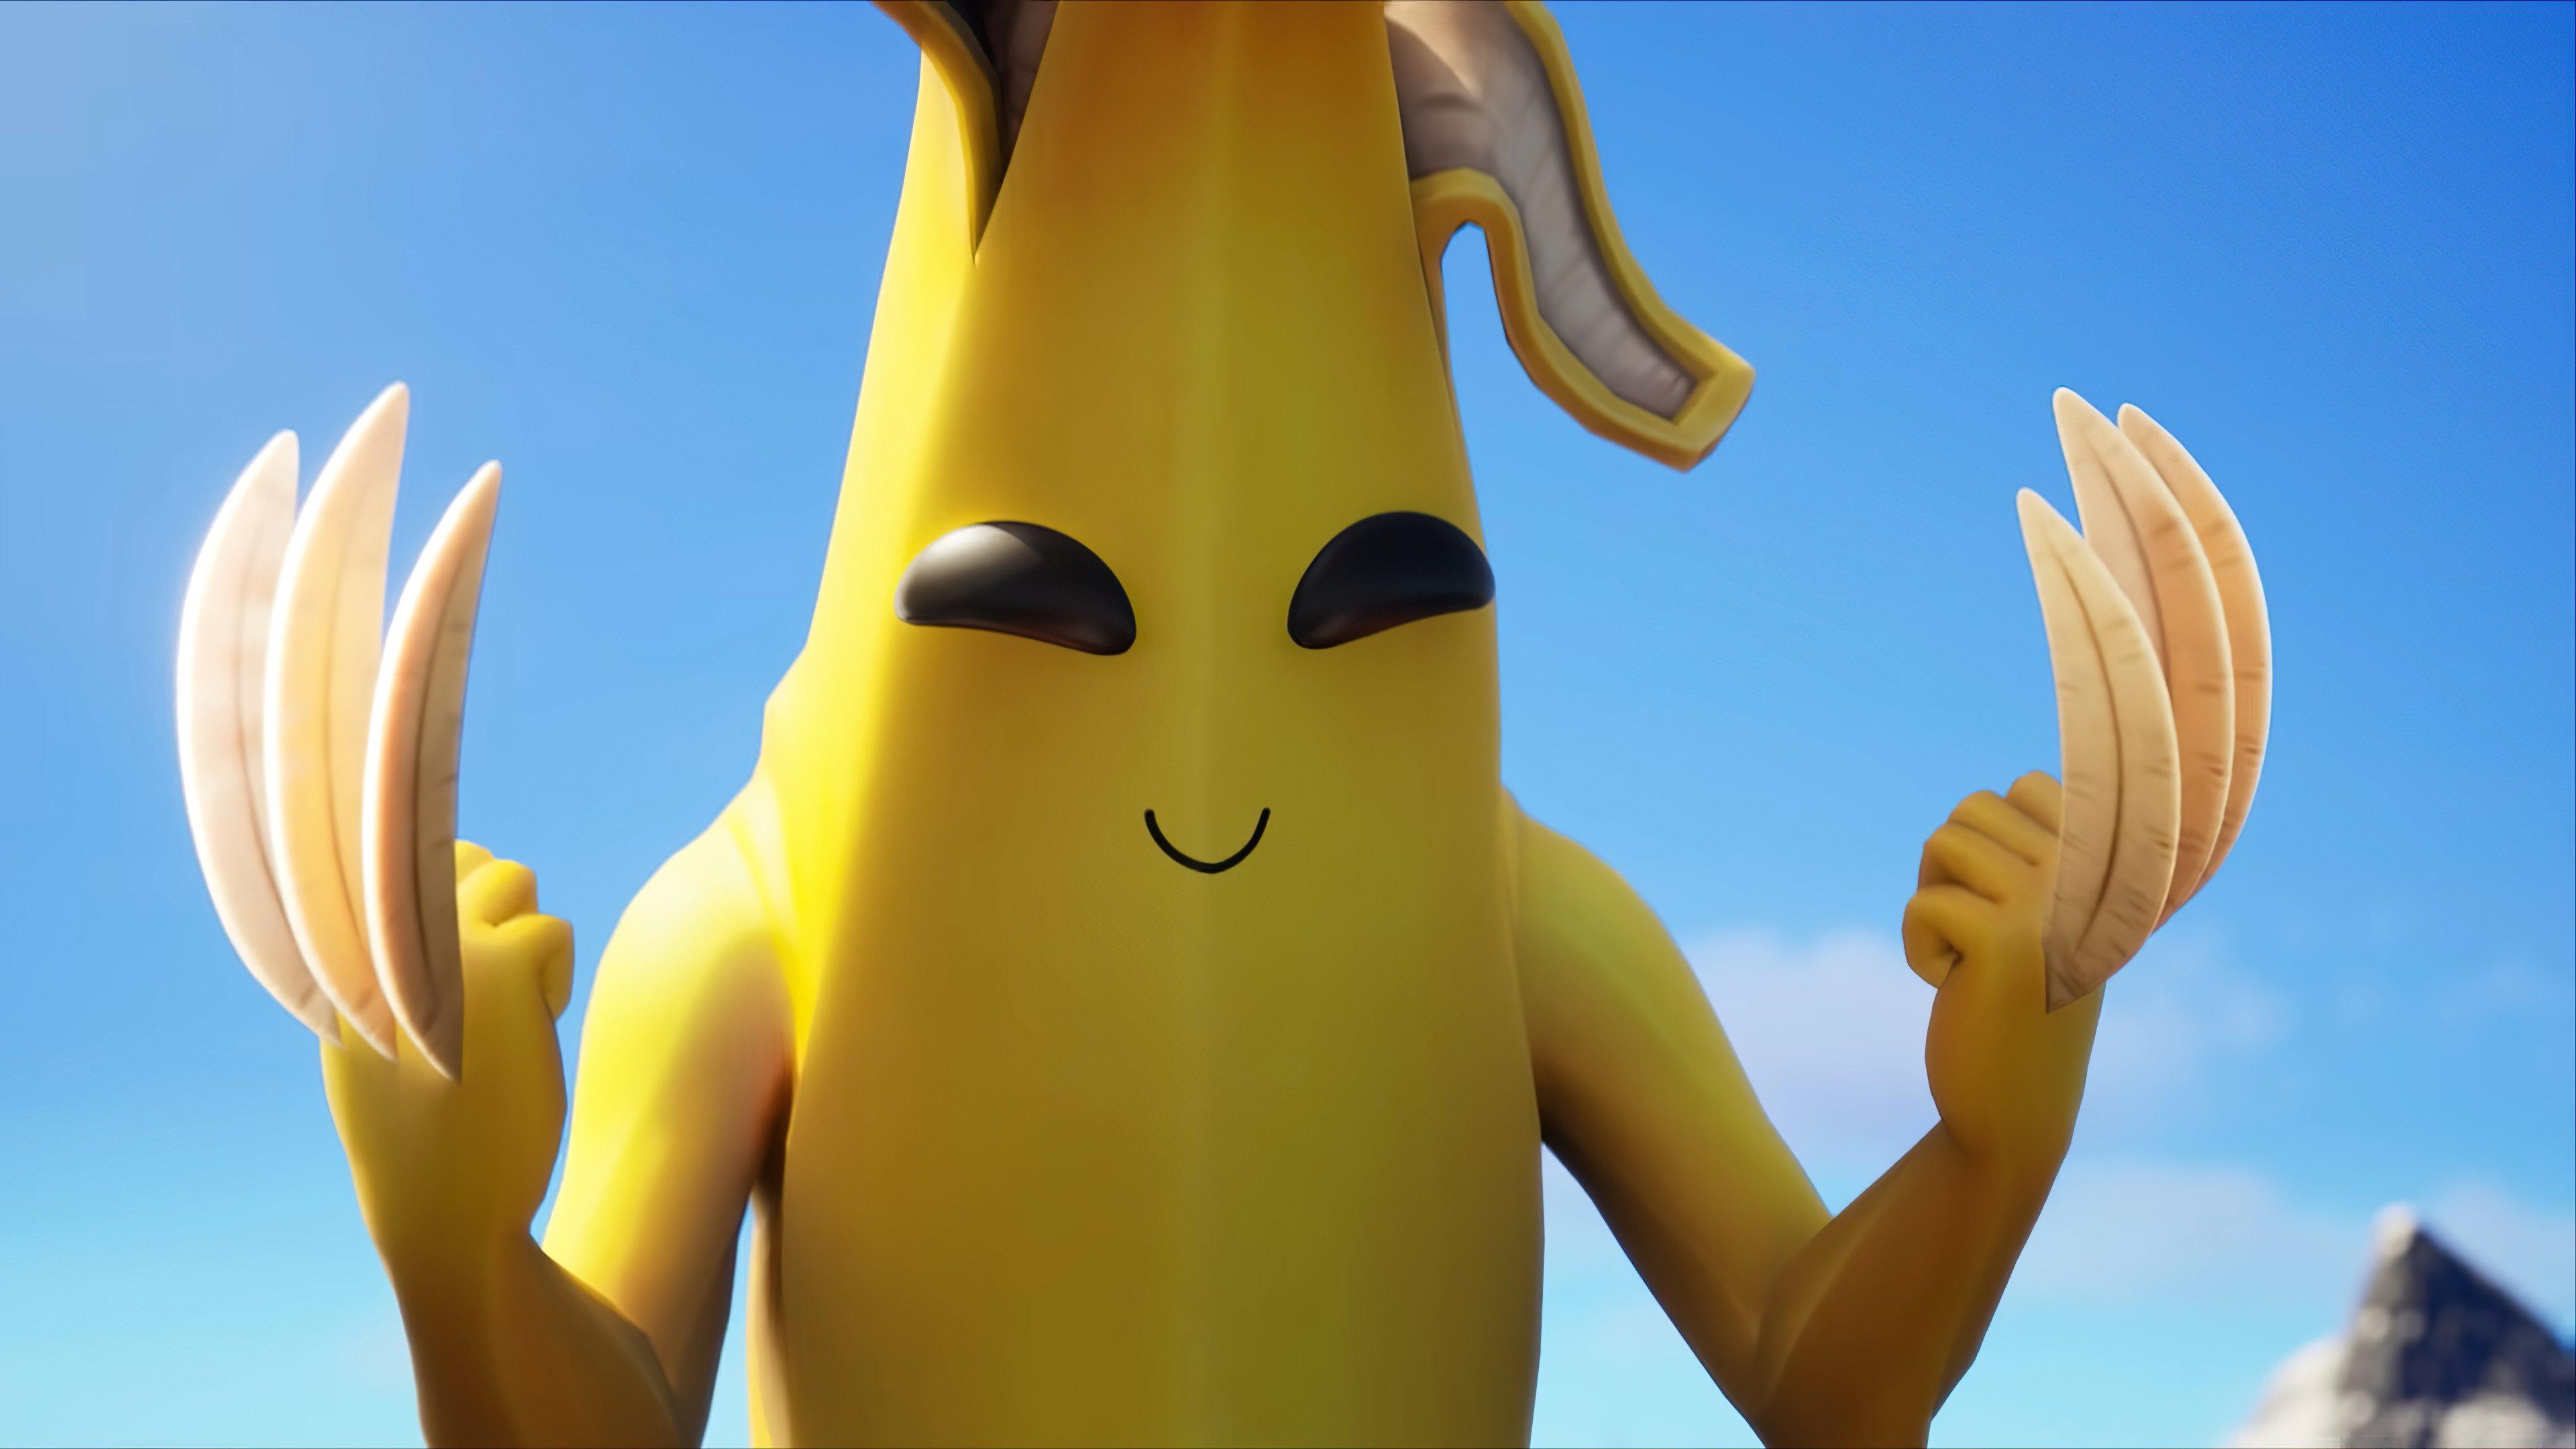 Fondos de pantalla Peely Banana Claw de Fortnite